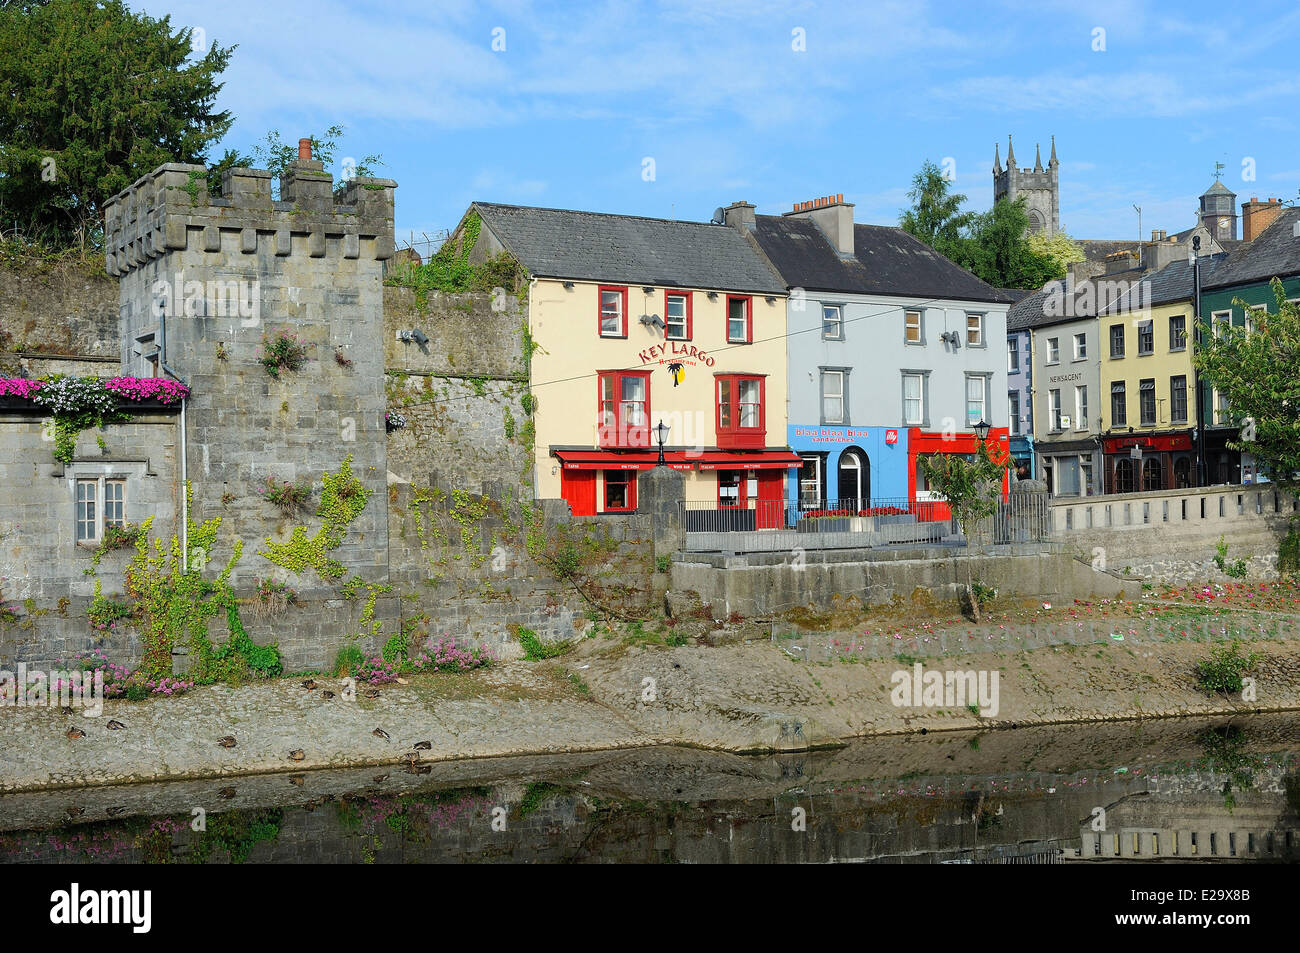 Ireland, County Kilkenny, Kilkenny, Banks of Nore river - Stock Image